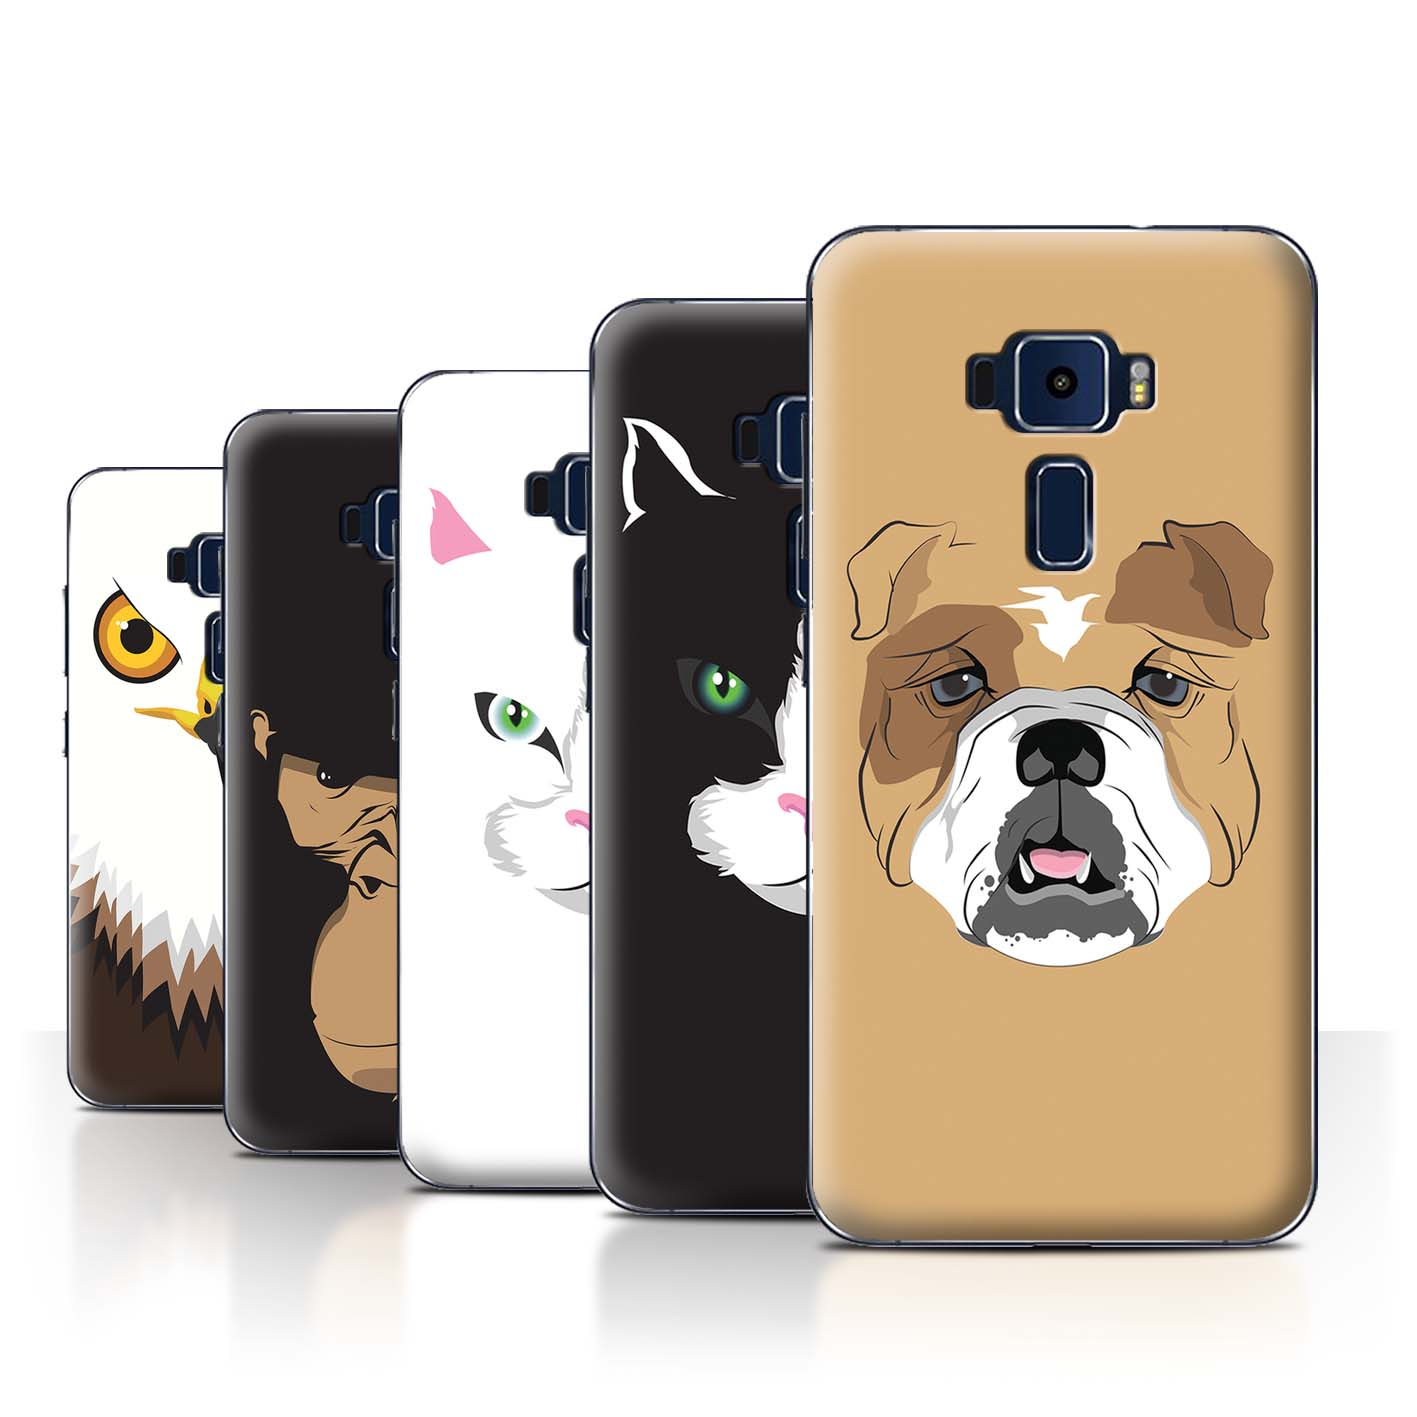 STUFF4-Back-Case-Cover-Skin-for-Asus-Zenfone-3-ZE552KL-Animal-Faces